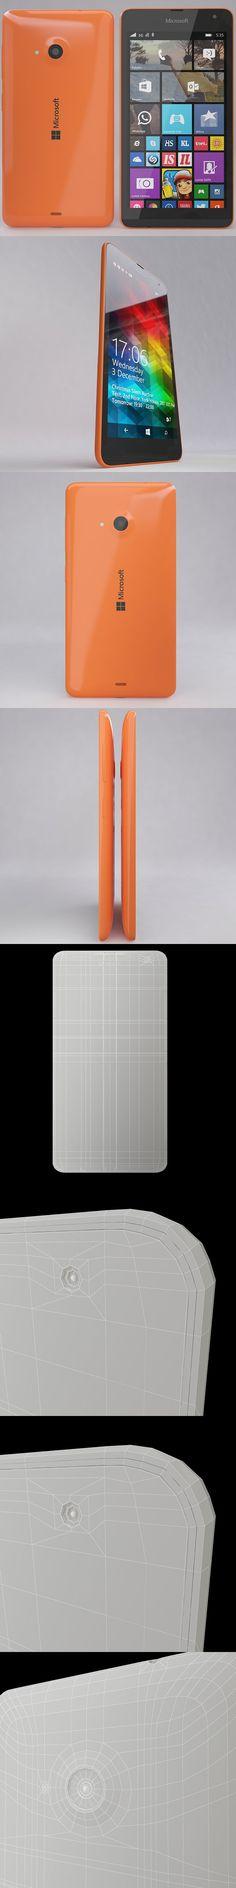 Microsoft Lumia 535 Orange. 3D Objects